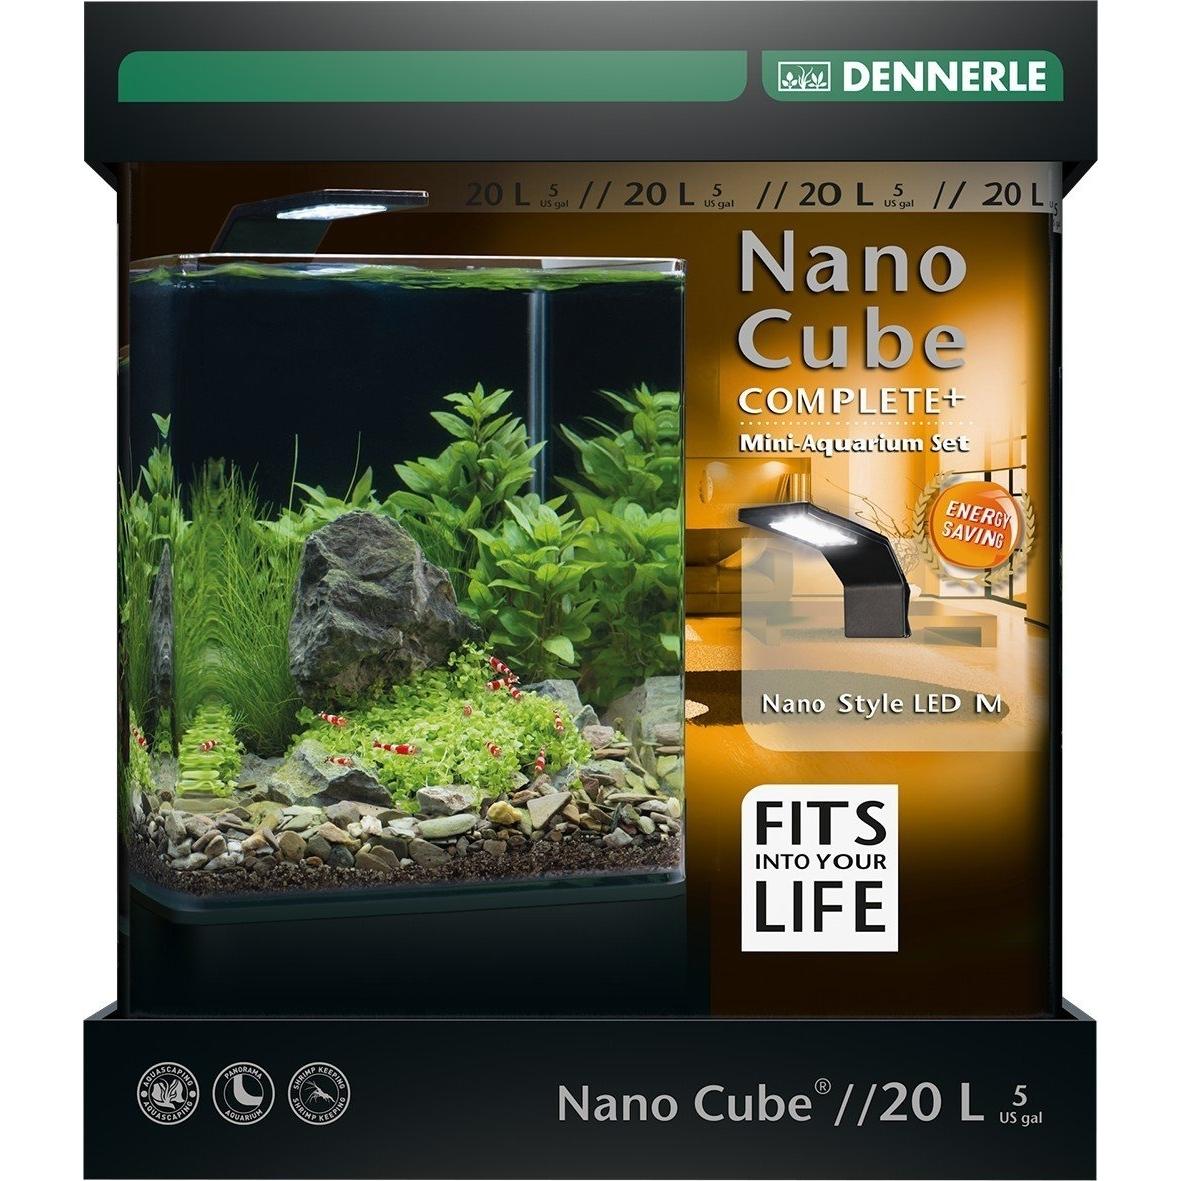 Dennerle NanoCube Complete+ Style LED, Bild 6